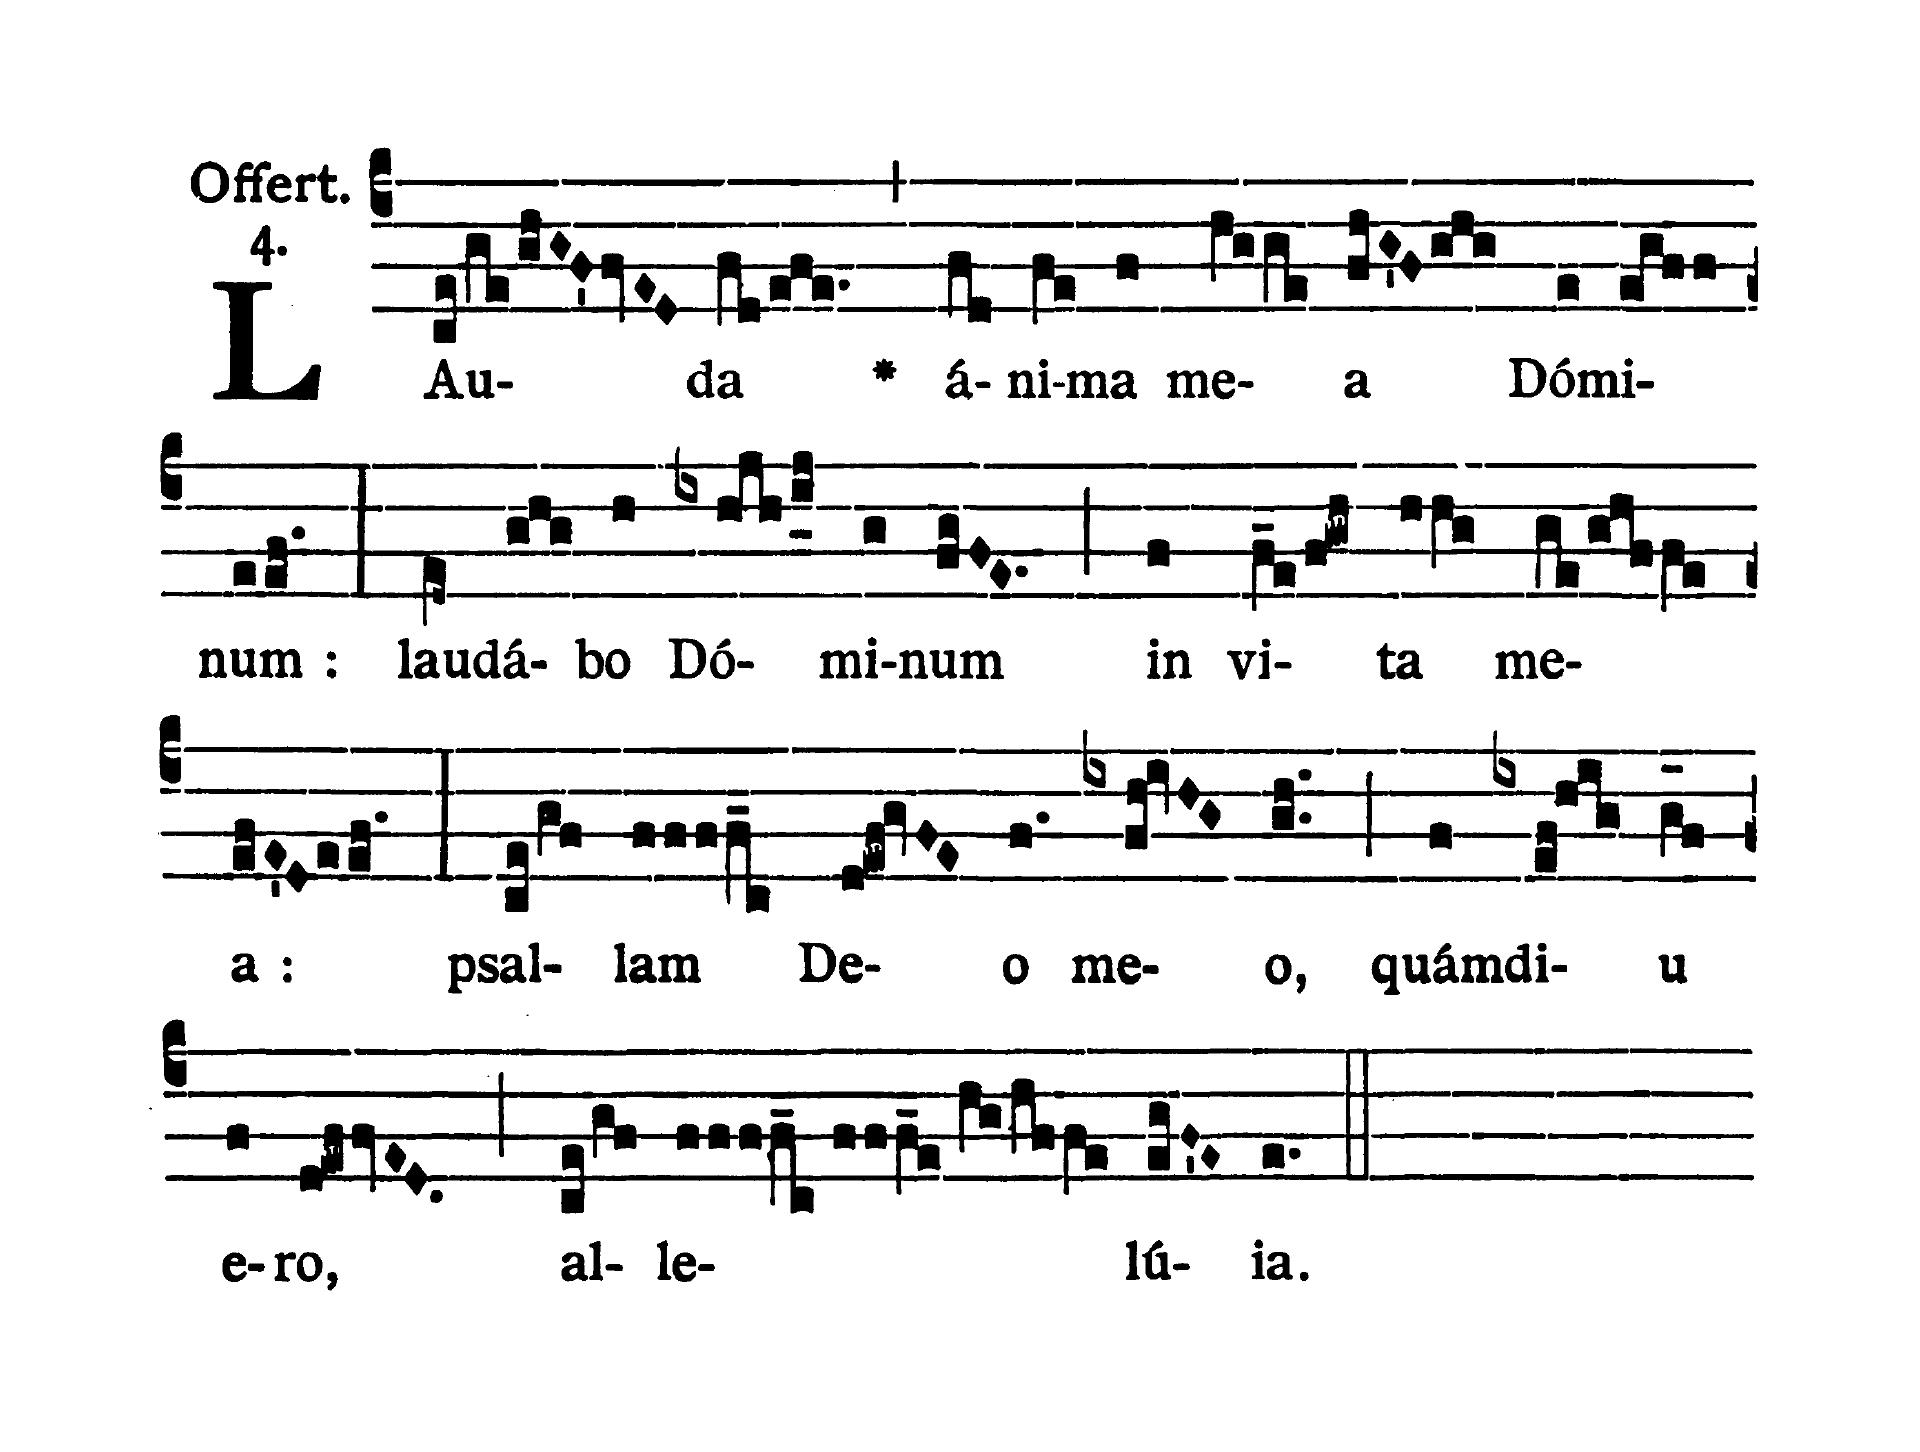 Feria sexta infra Octavam Pentecostes (Piątek w oktawie Zesłania Ducha Świętego) - Offertorium (Lauda anima mea)